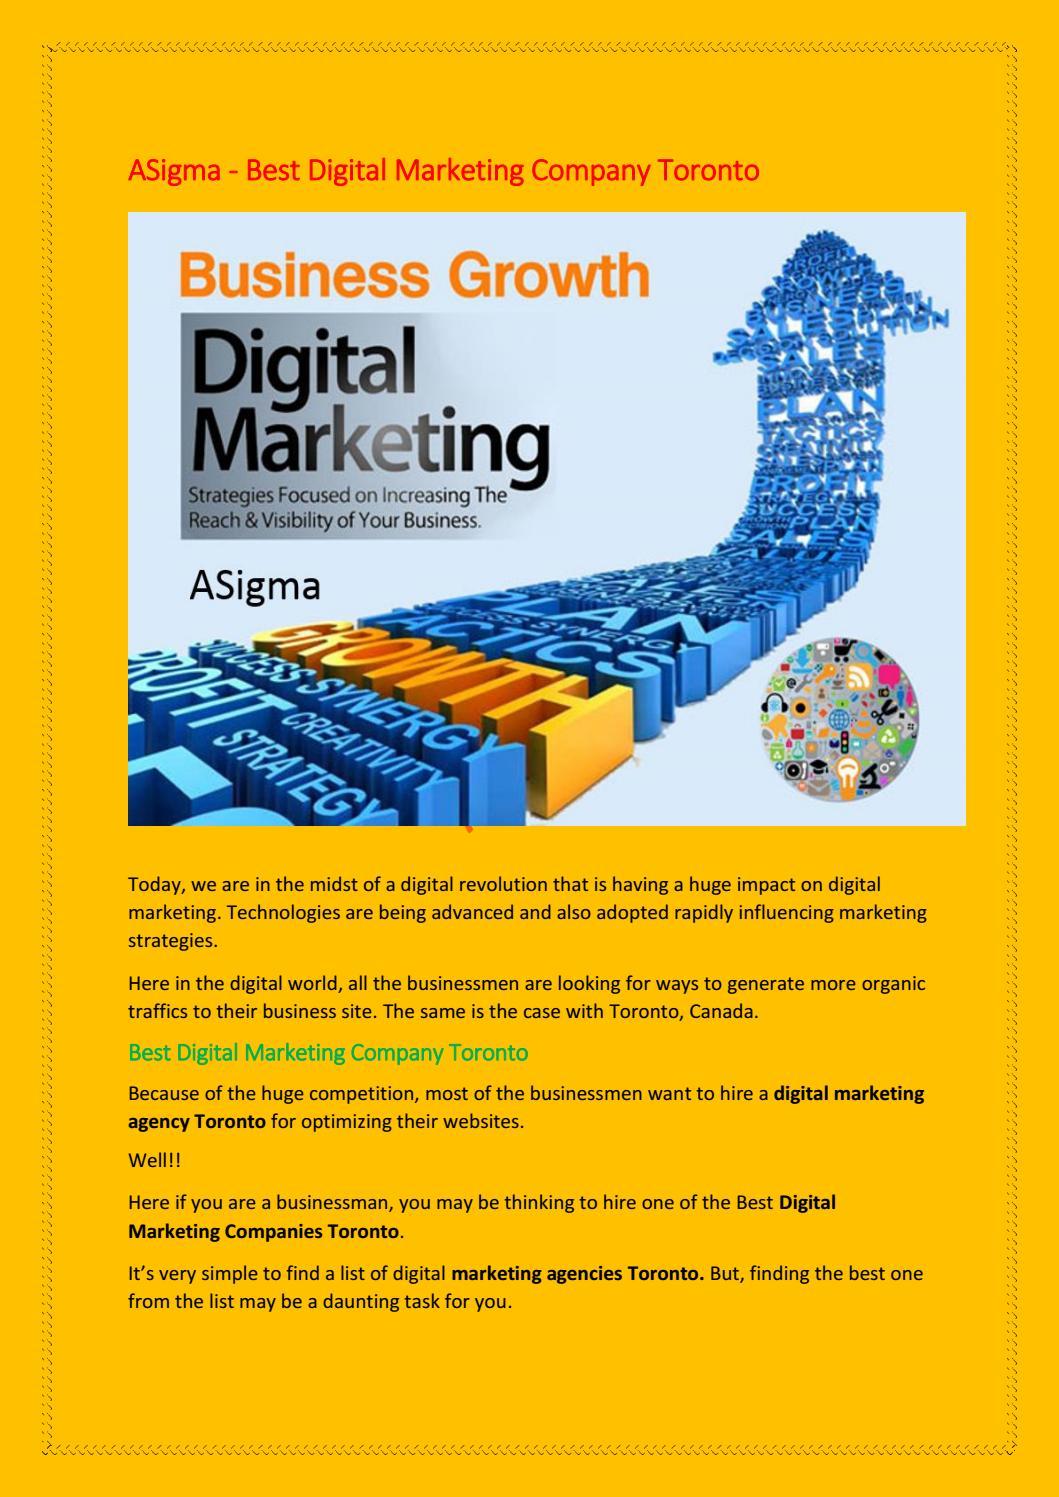 ASigma - Best Digital Marketing Company Toronto by Asigma Toronto